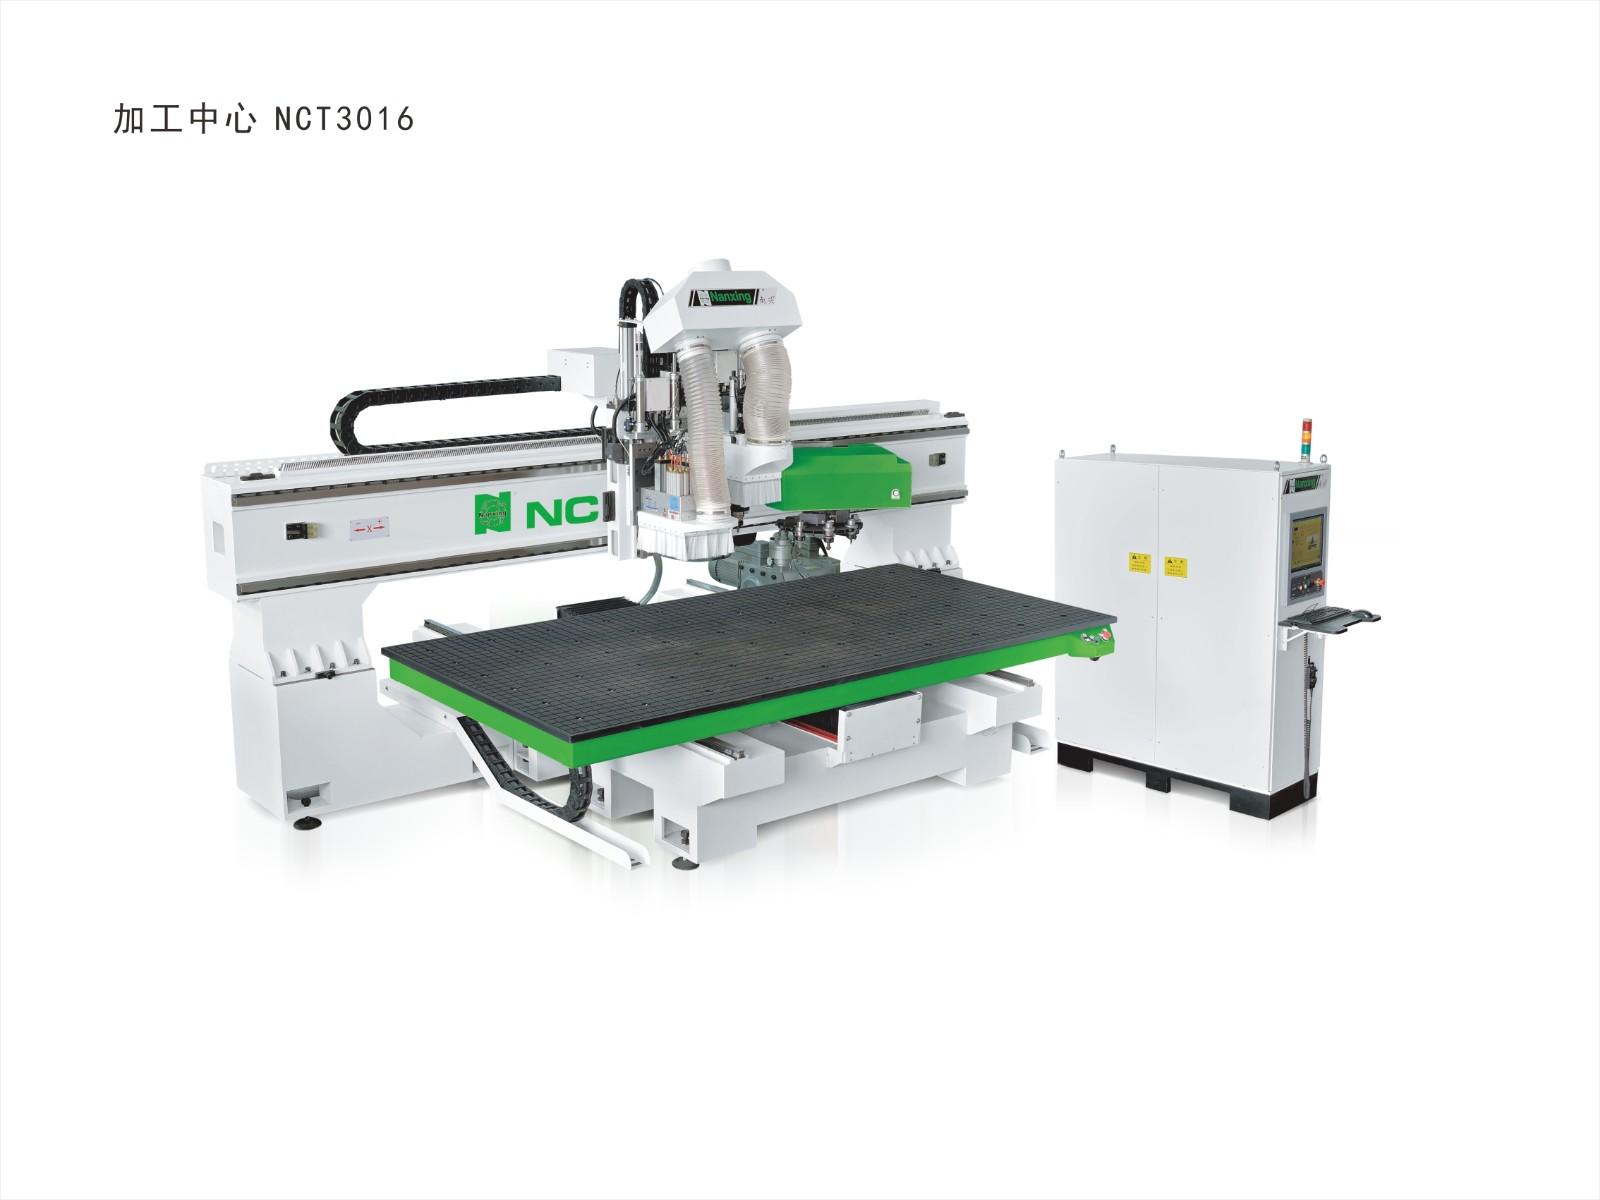 加工中心 NCT3016(原MGK07)